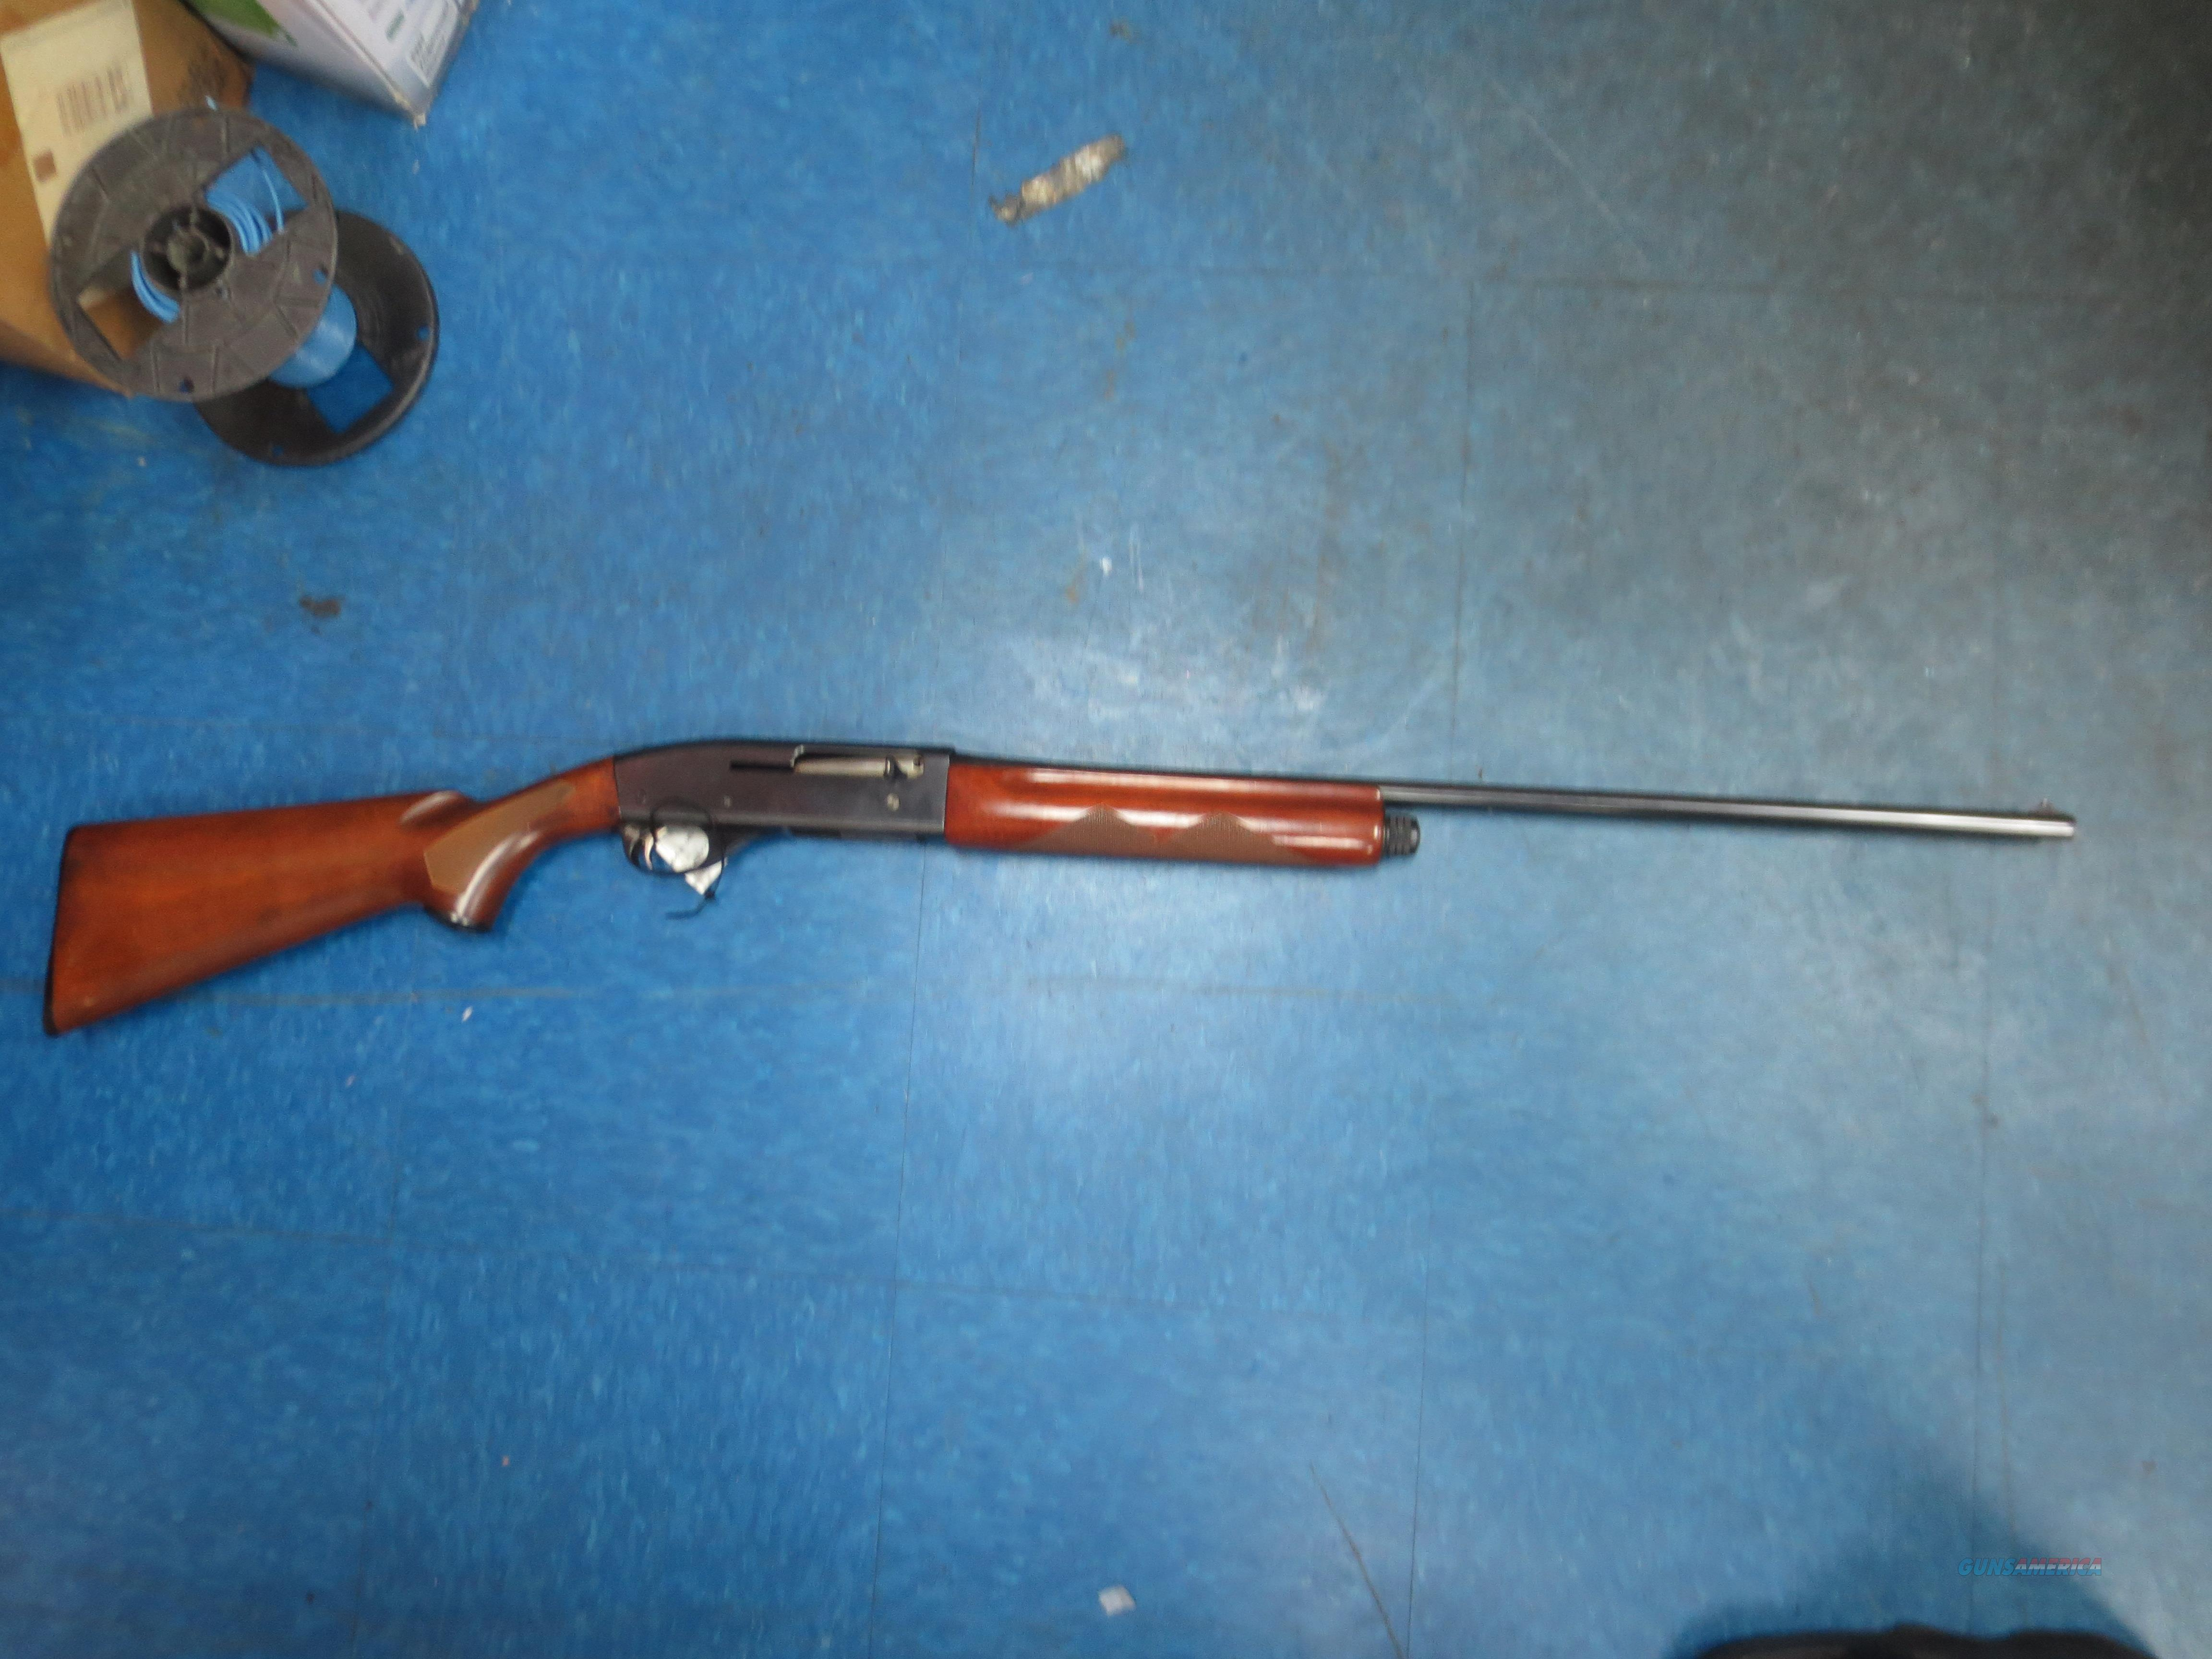 Remington model 11-48 Semi-auto 410 gauge  Guns > Shotguns > Remington Shotguns  > Autoloaders > Hunting